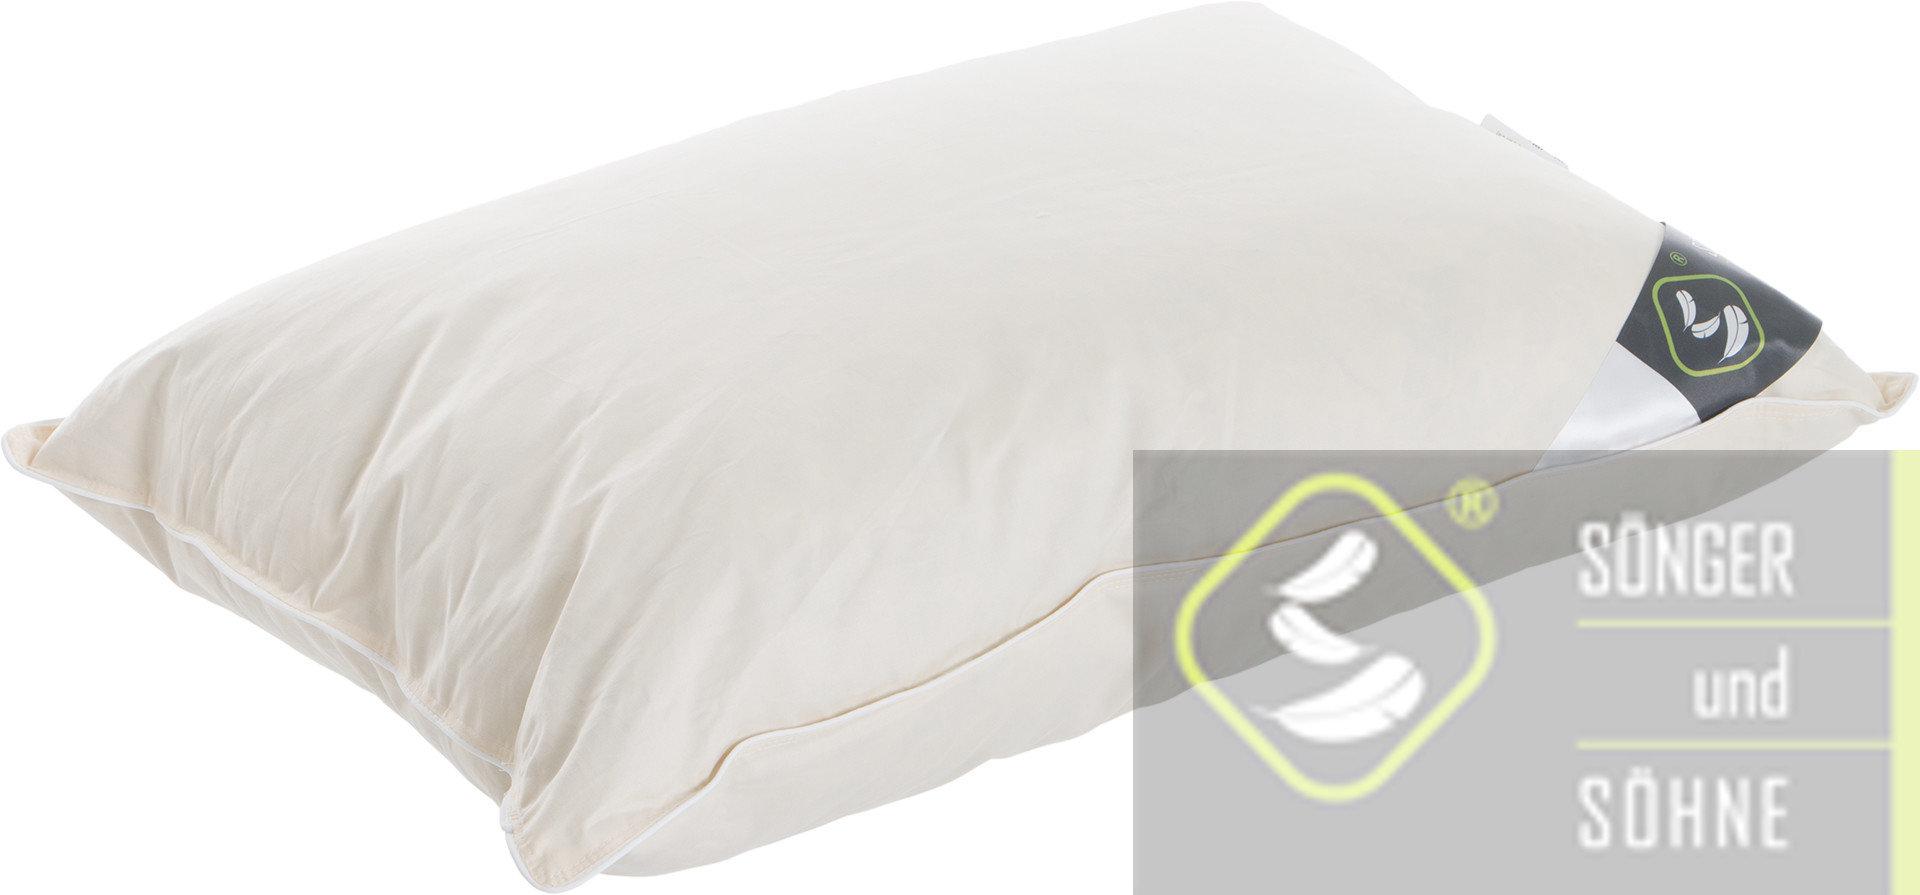 Подушка Elsa 50х70 см пух (5%)  перо (95%) Sönger und Söhne